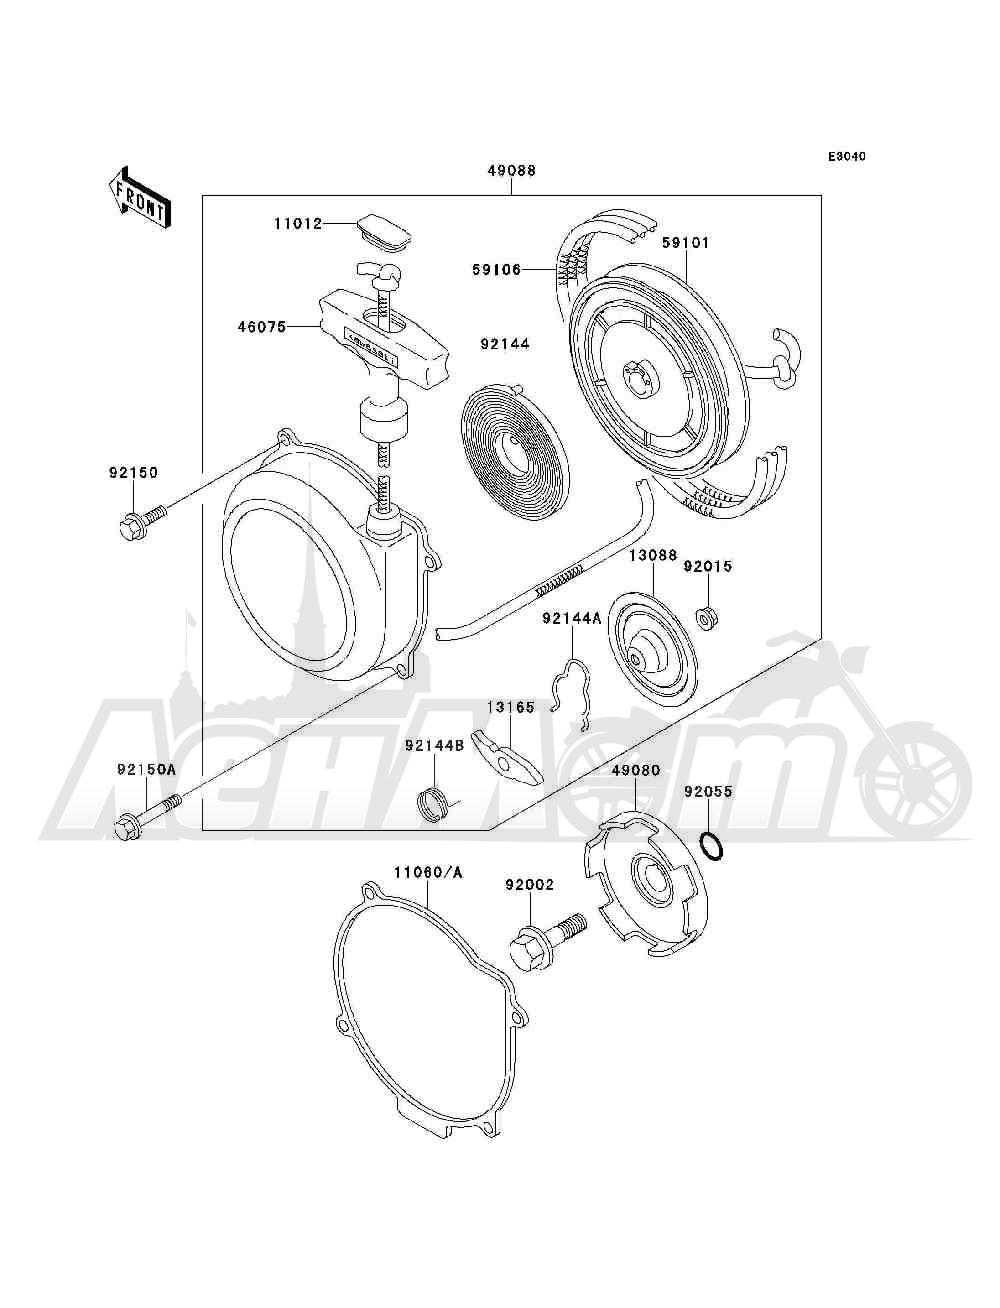 Запчасти для Квадроцикла Kawasaki 1994 BAYOU 300 4X4 (KLF300-C6) Раздел: RECOIL STARTER | ручной стартер